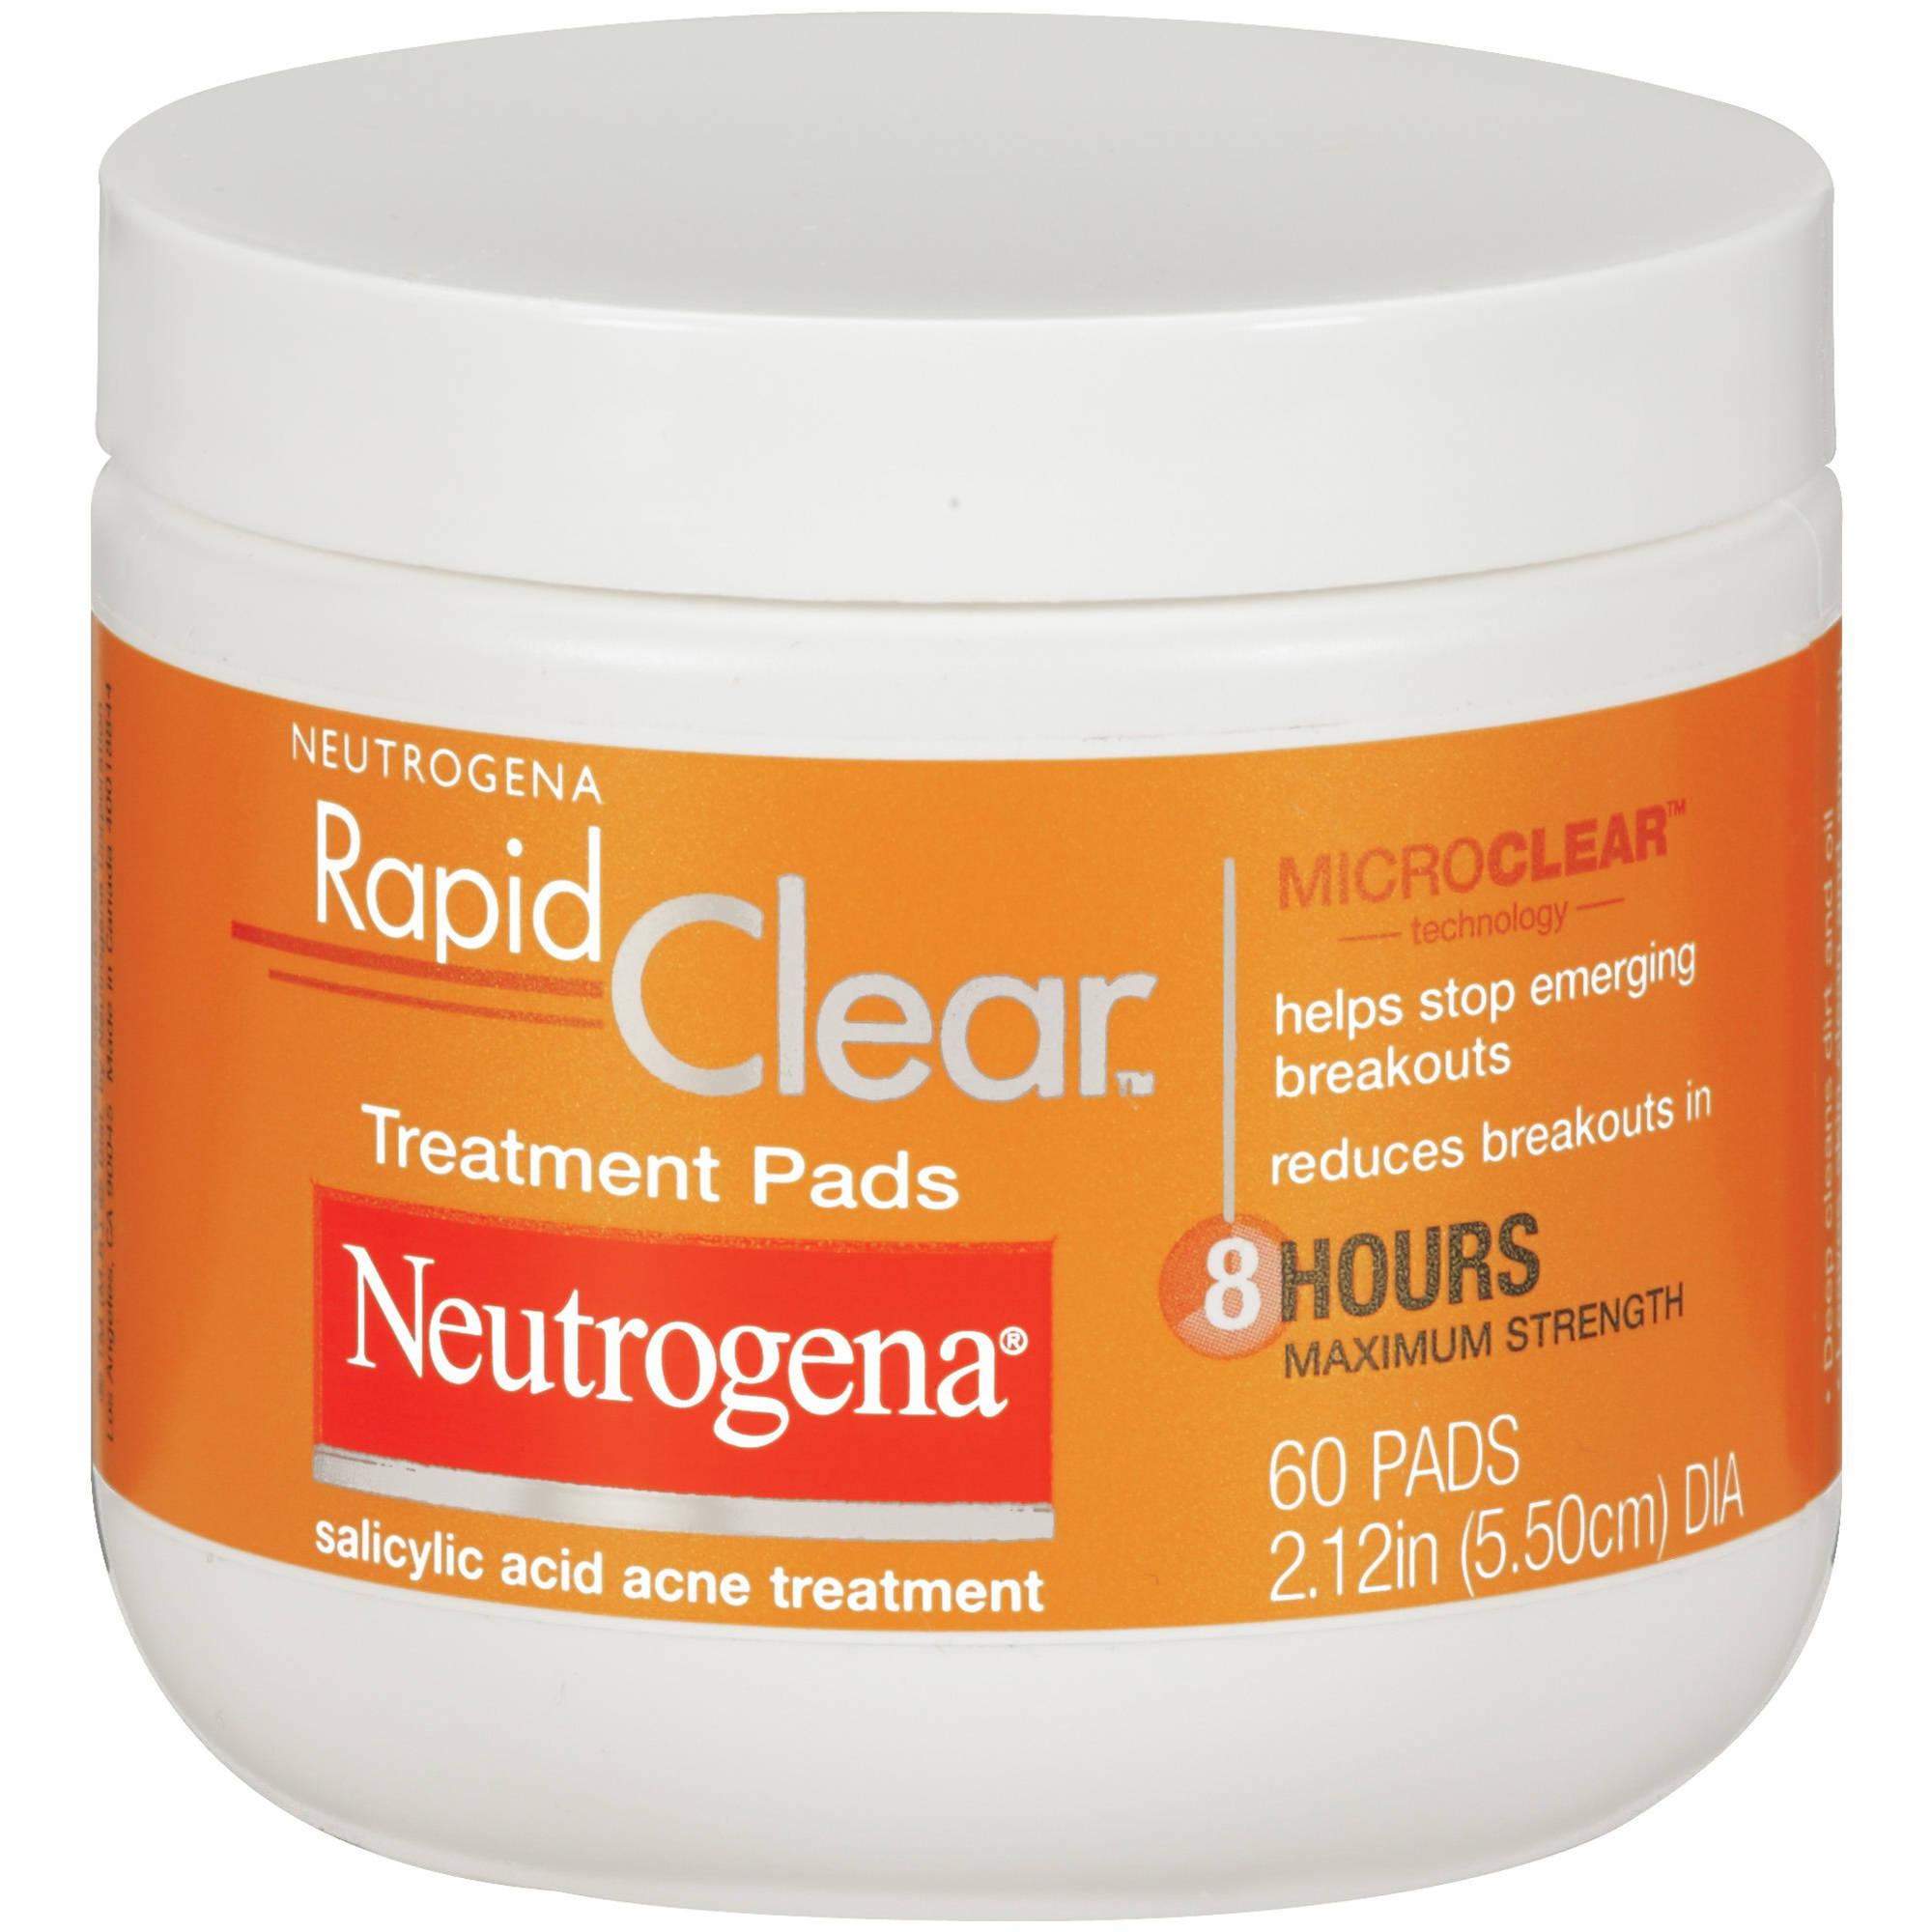 Neutrogena Rapid Clear Treatment Pads, 60 count